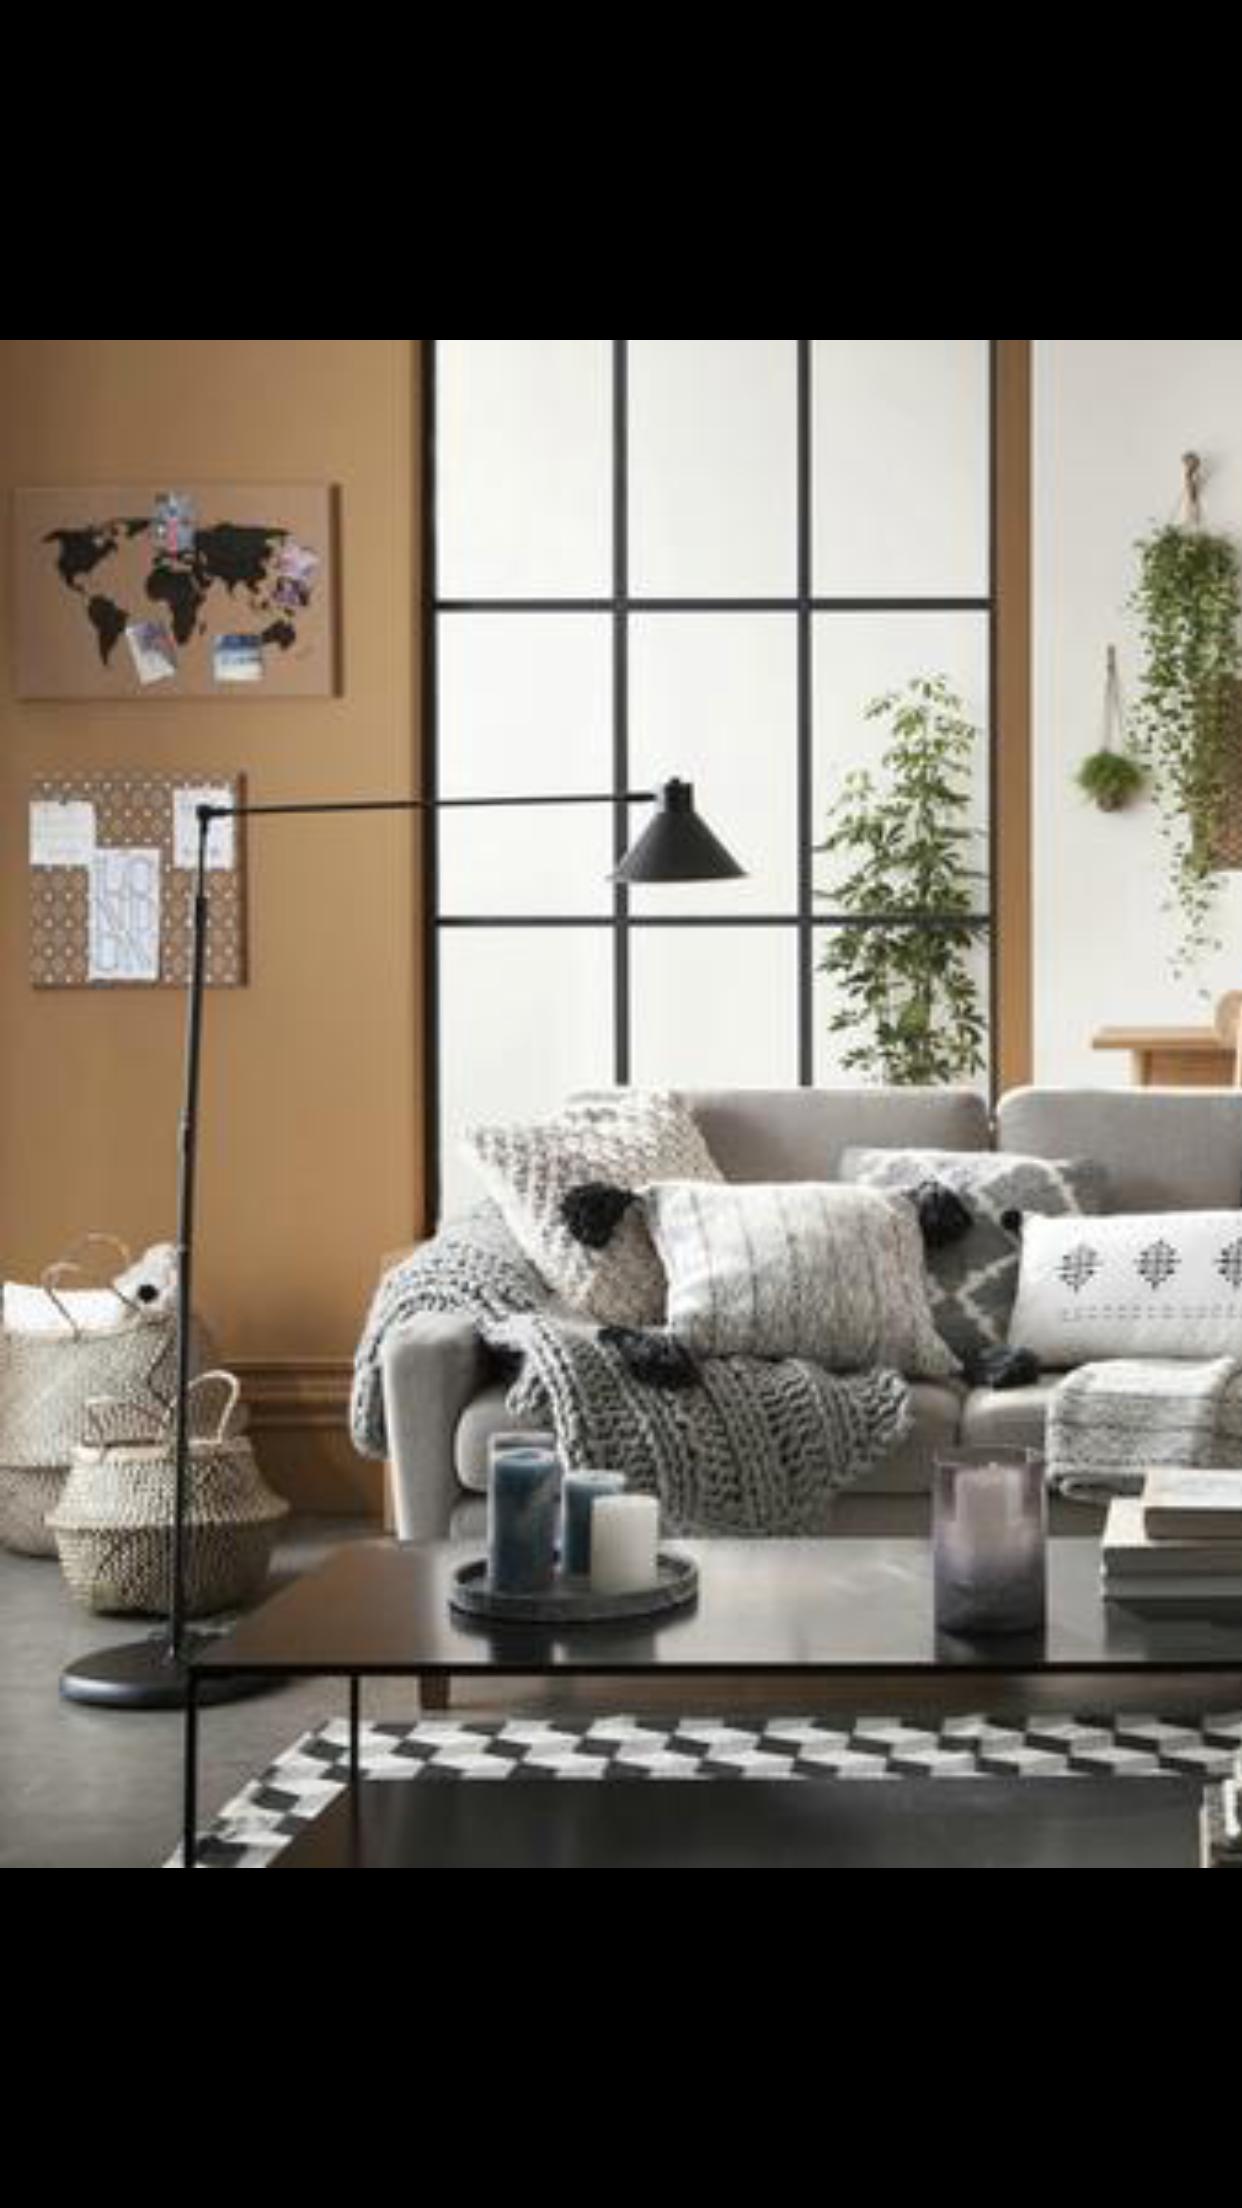 Zodio Di Leroy Marlin Idee Ikea H M Home Pinterest # Meuble Tv Zodio